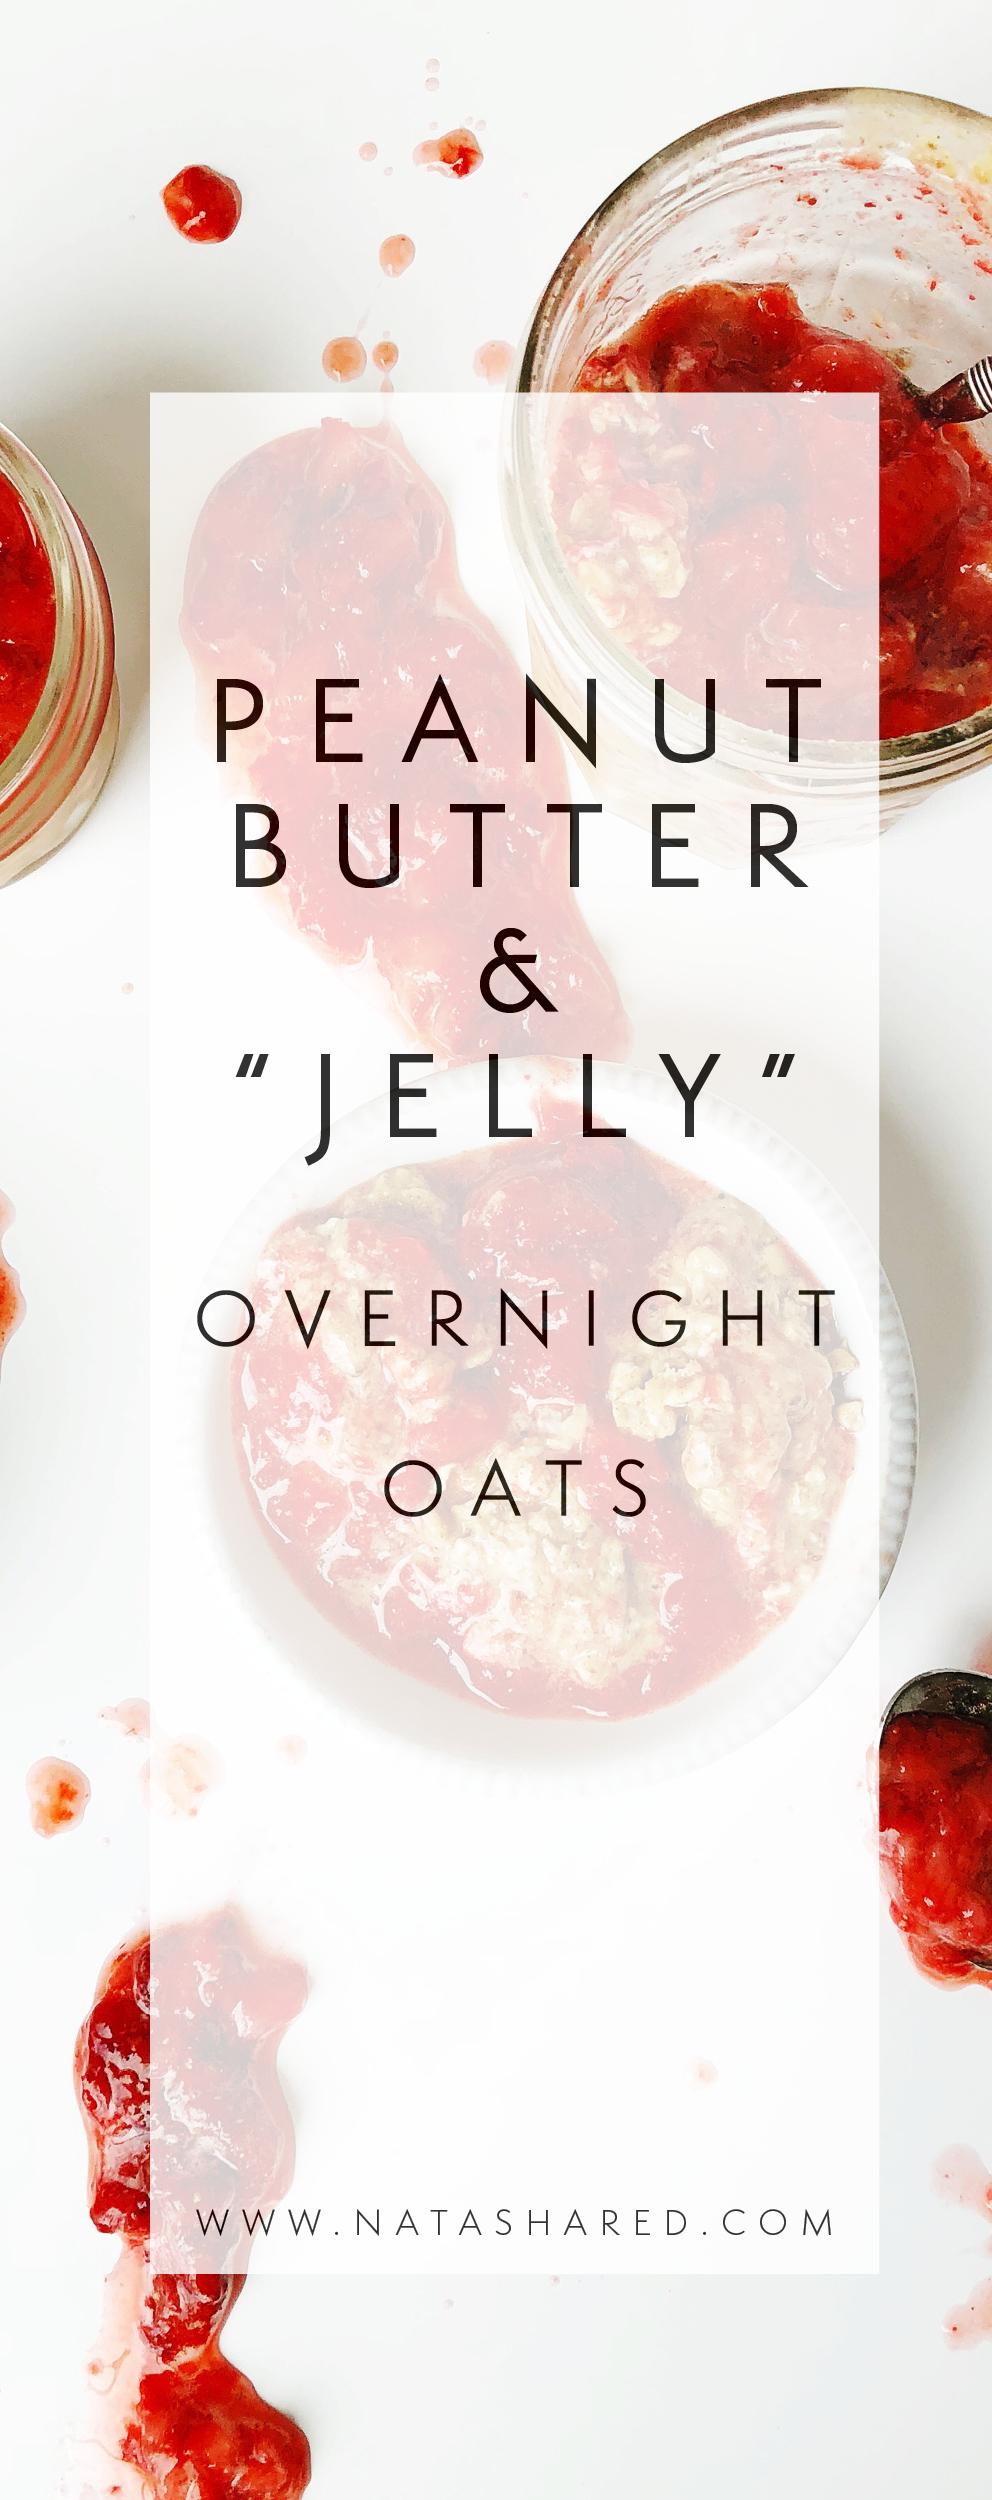 Peanut Butter & Jelly Overnight Oats | Overnight Oats Club